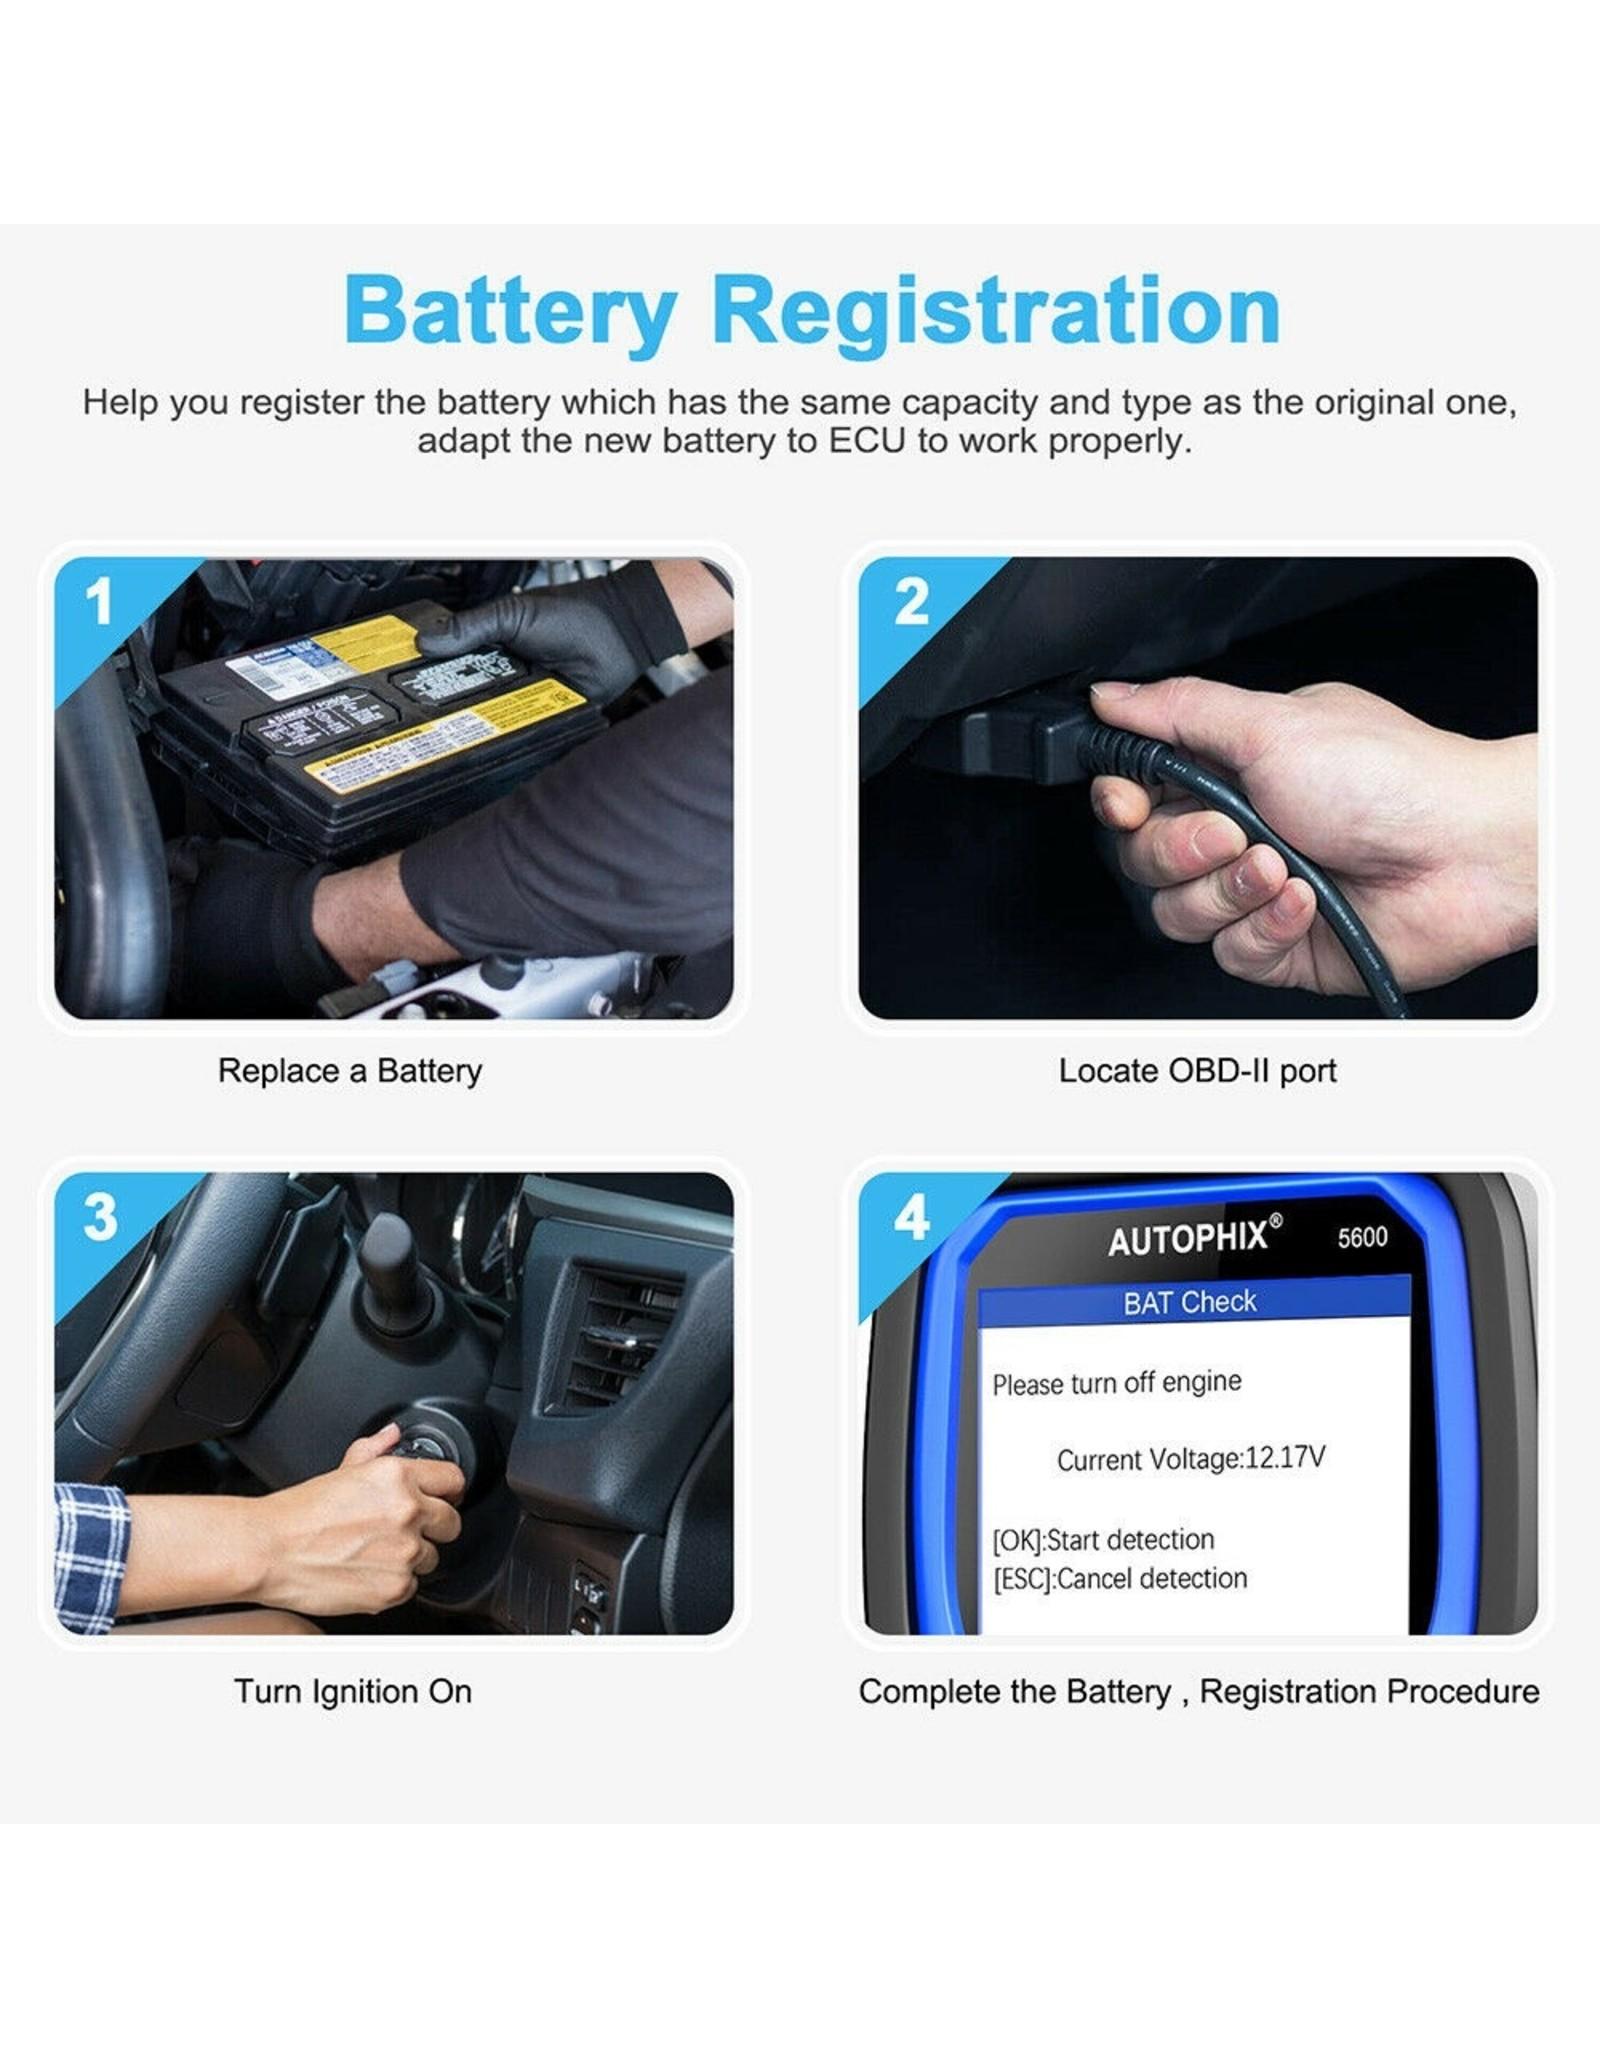 Autophix 5600 OBD2 auto scanner voor Volkswagen Audi Skoda Seat Oil Service EPB BAT BMS ETCS Reset OBDII Code Reader Check Engine Automotive Diagnostisch Tool